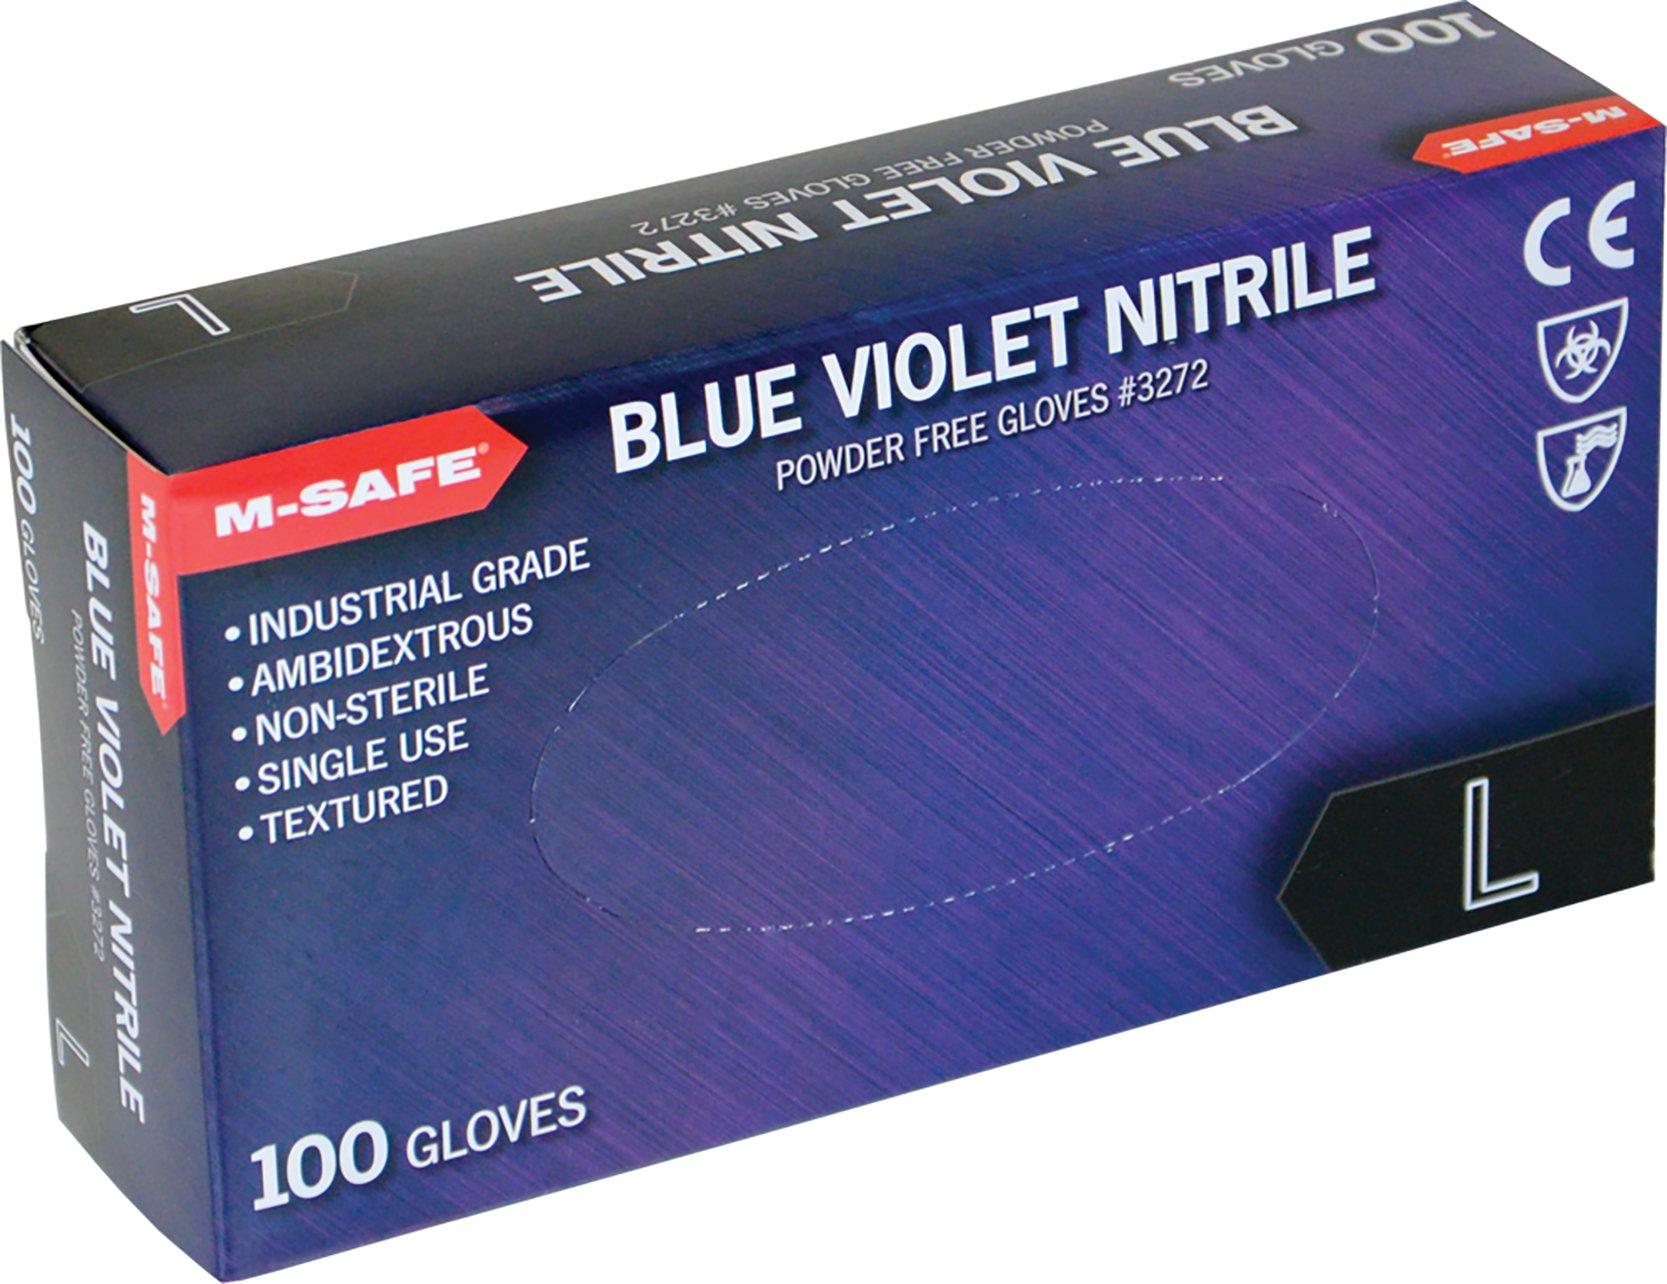 (20 Boxes) Majestic POWDER FREE 3MIL DISPOSABLE NITRILE GLOVES, 100/BOX - 2X LARGE(3272/12)